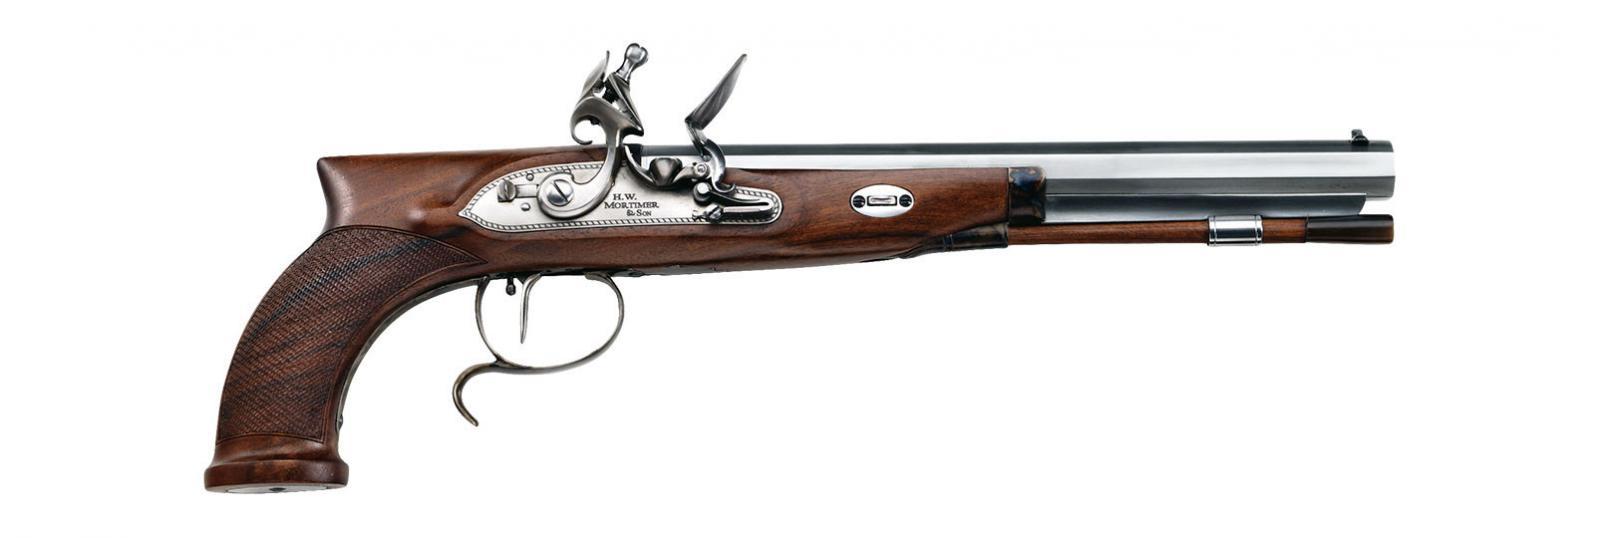 Pistolet D. PEDERSOLI MORTIMER  Silex cal. 44 PN